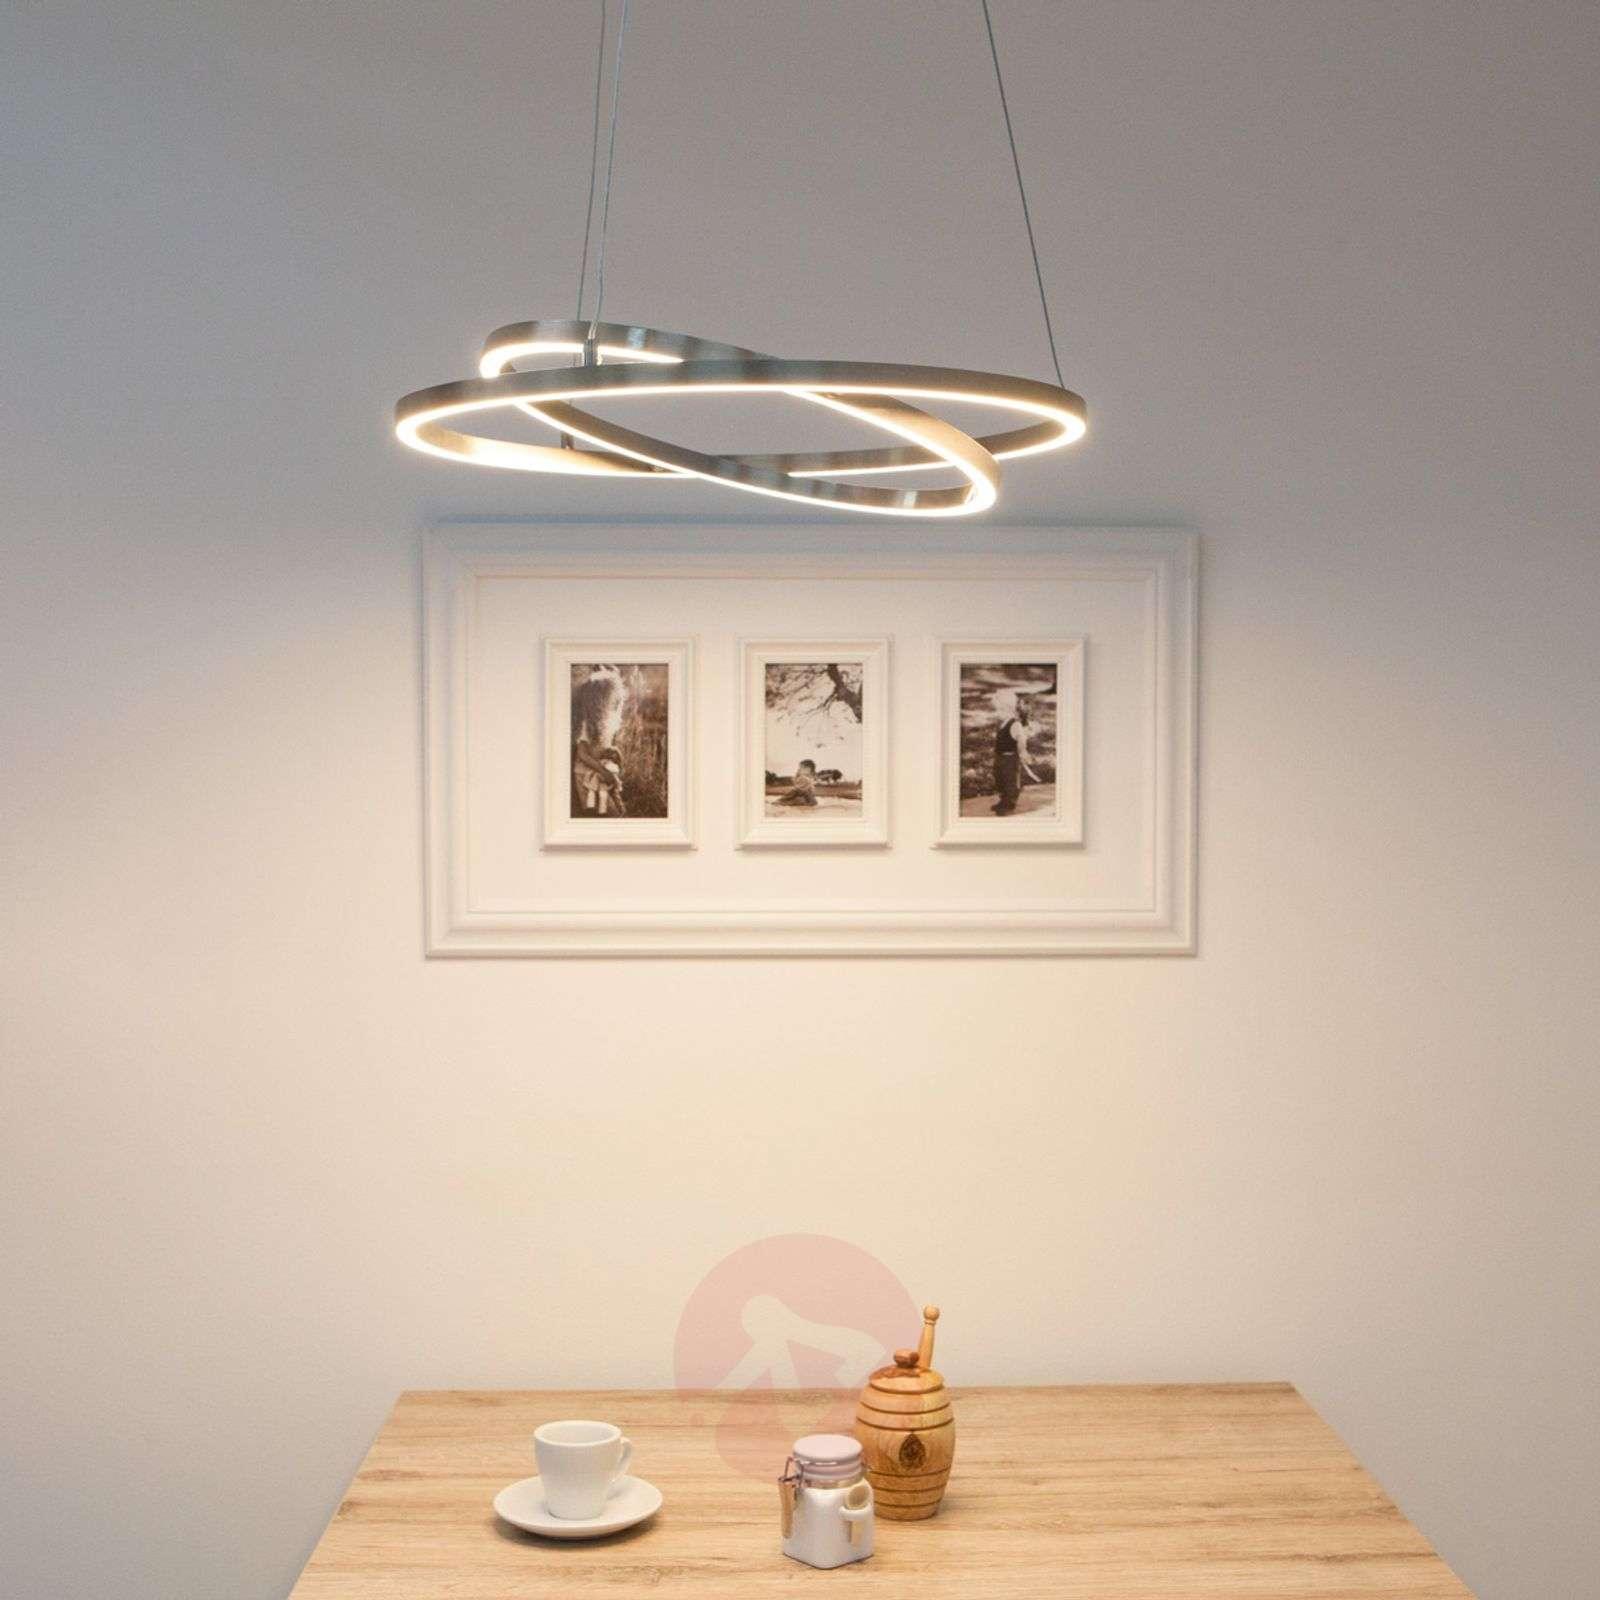 Lovisa LED hanging light with two LED rings-7620002-02